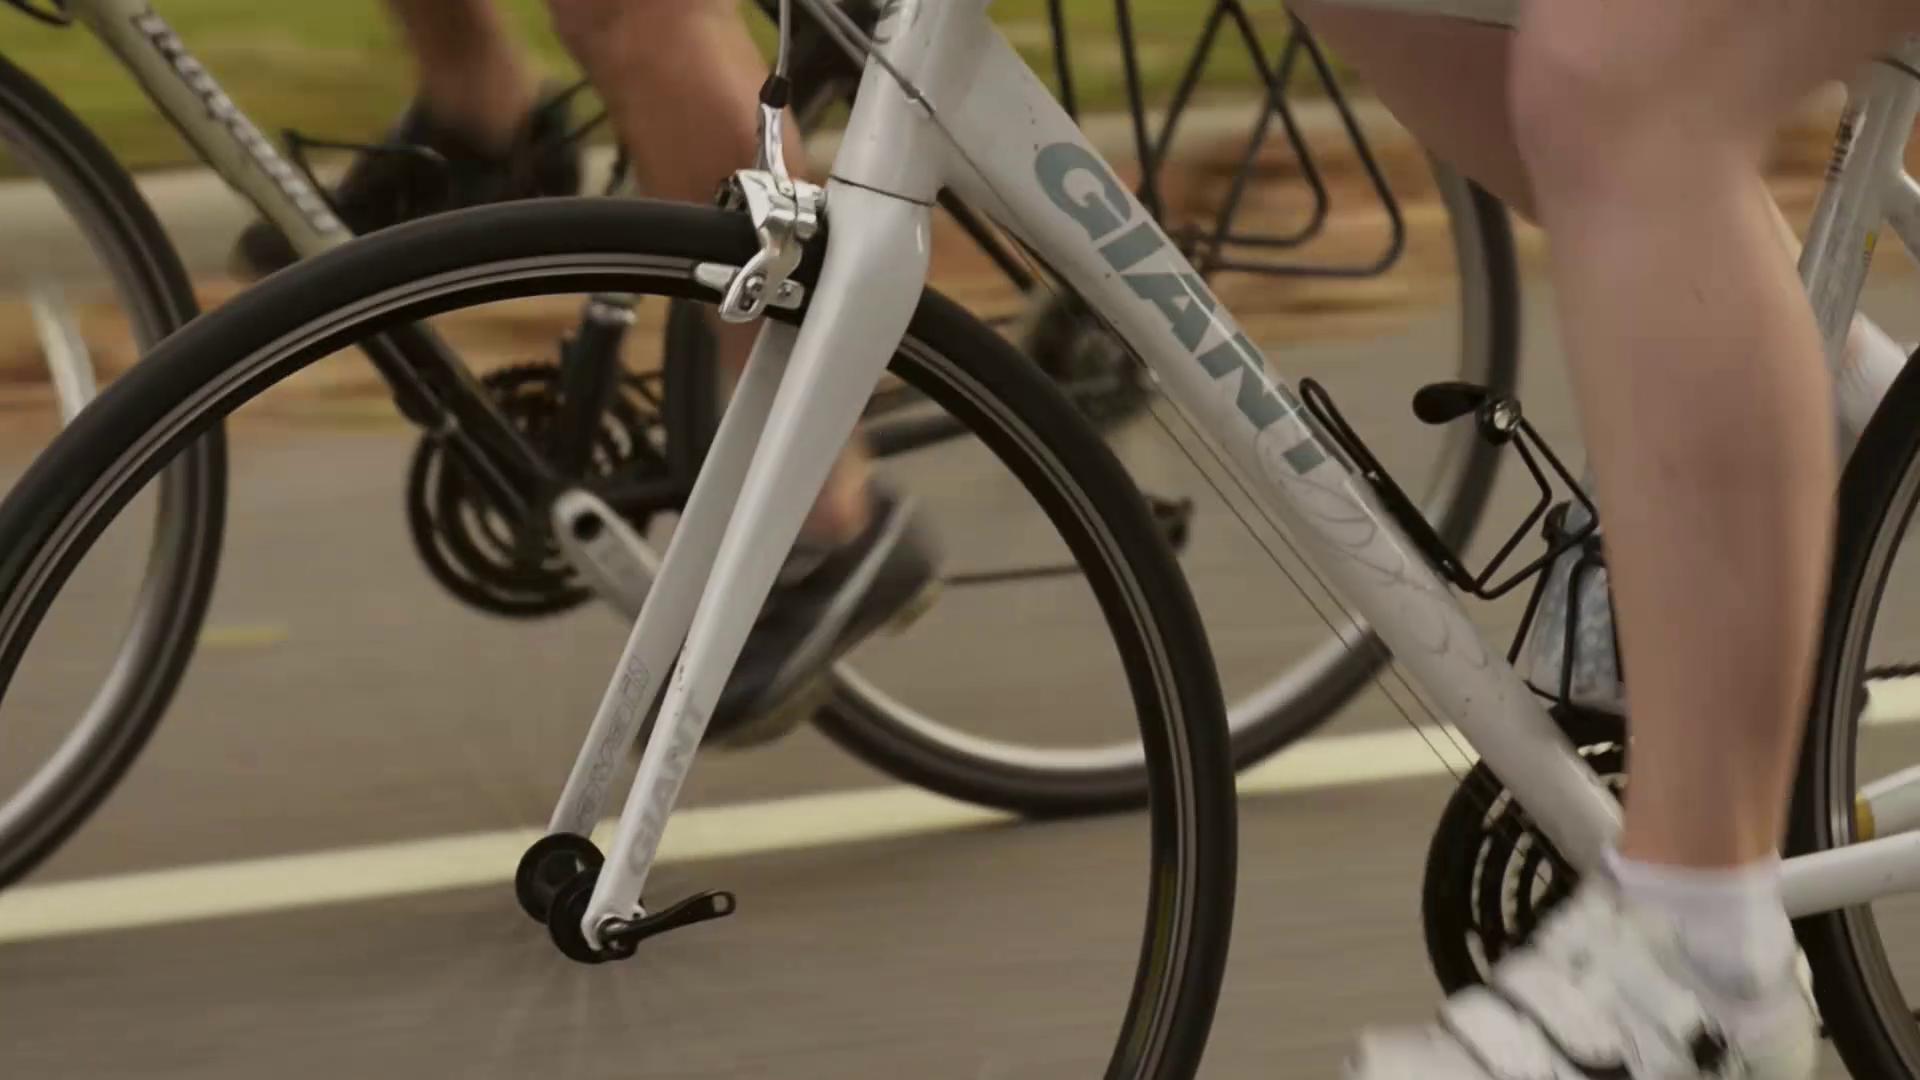 Cyclingteam-bikes